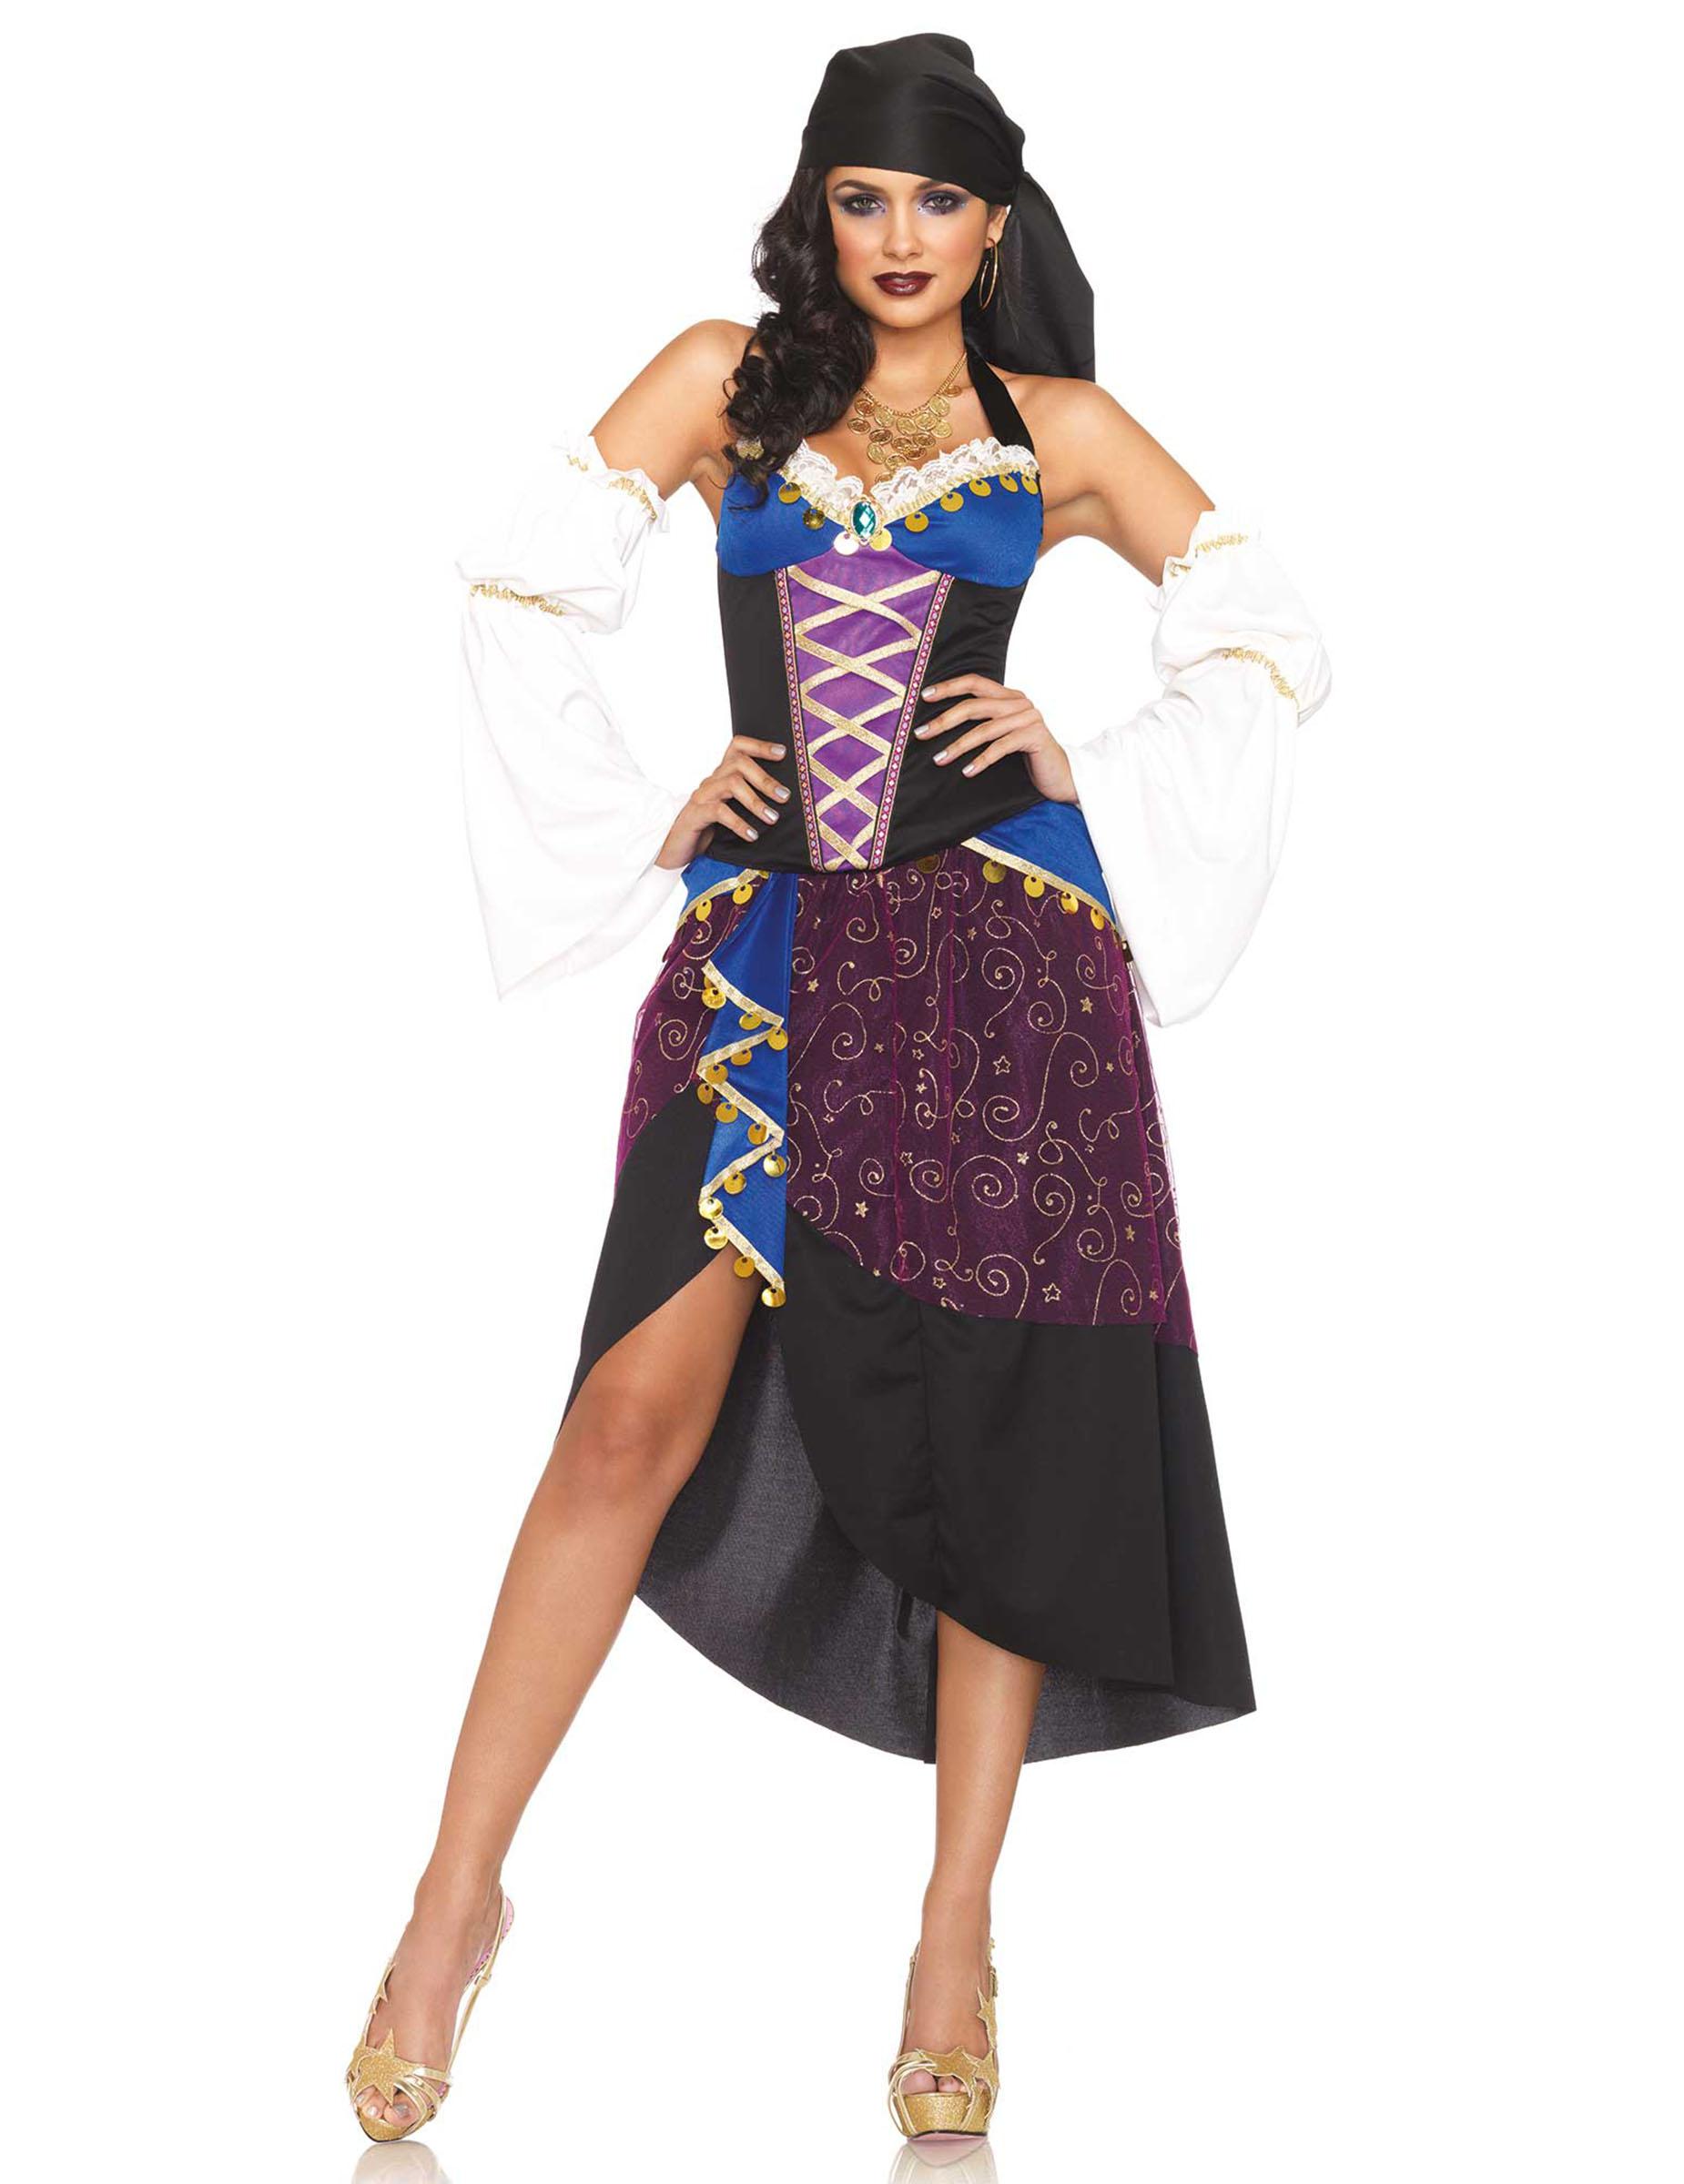 Gitana DonnaCostumi Da Asimmetrica Adulti e Con Per Gonna Costume fIYb7v6gy